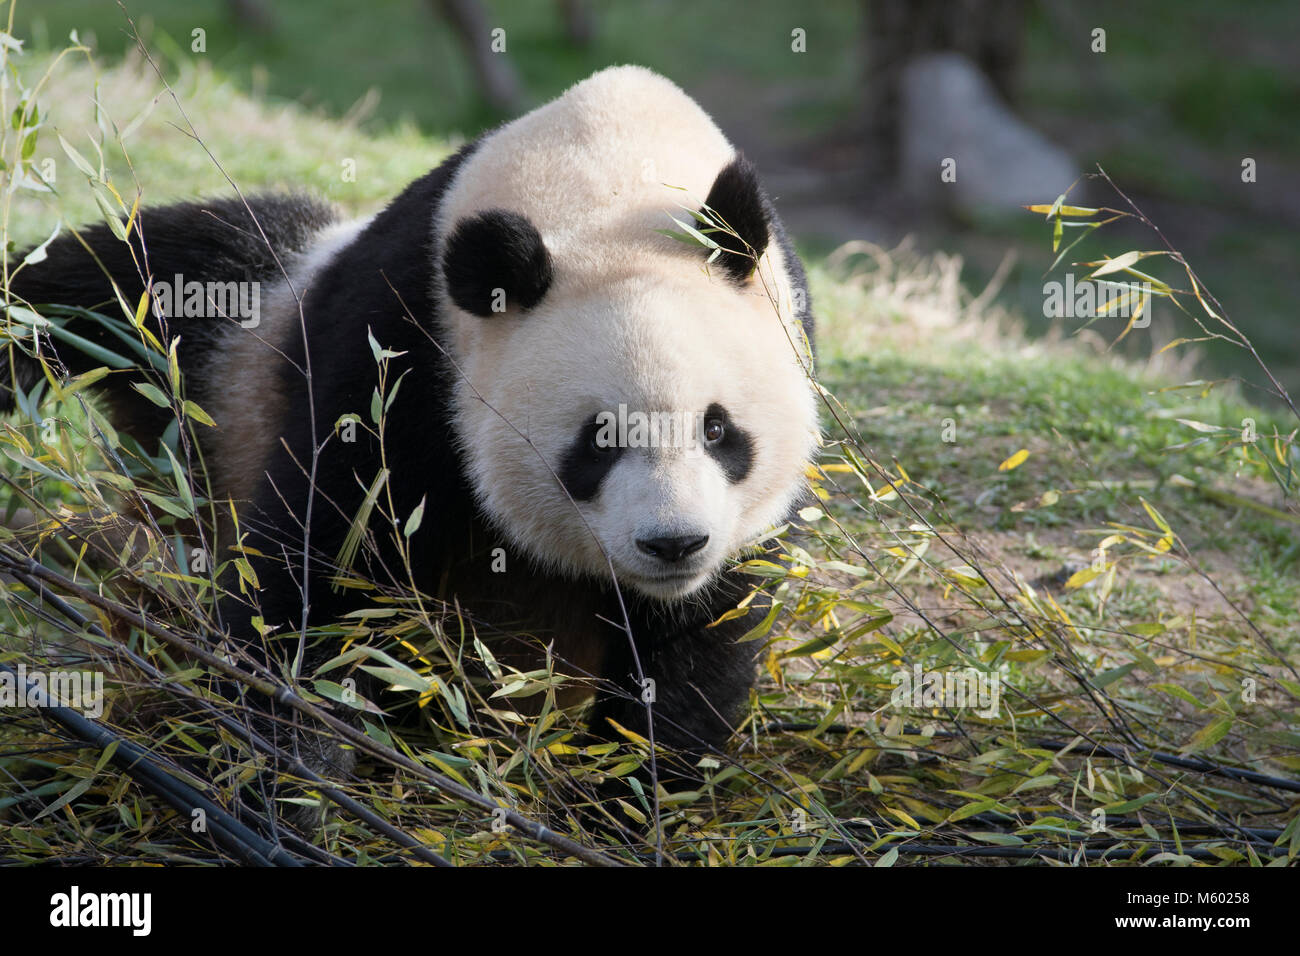 Male giant panda among bamboo leaves - Stock Image